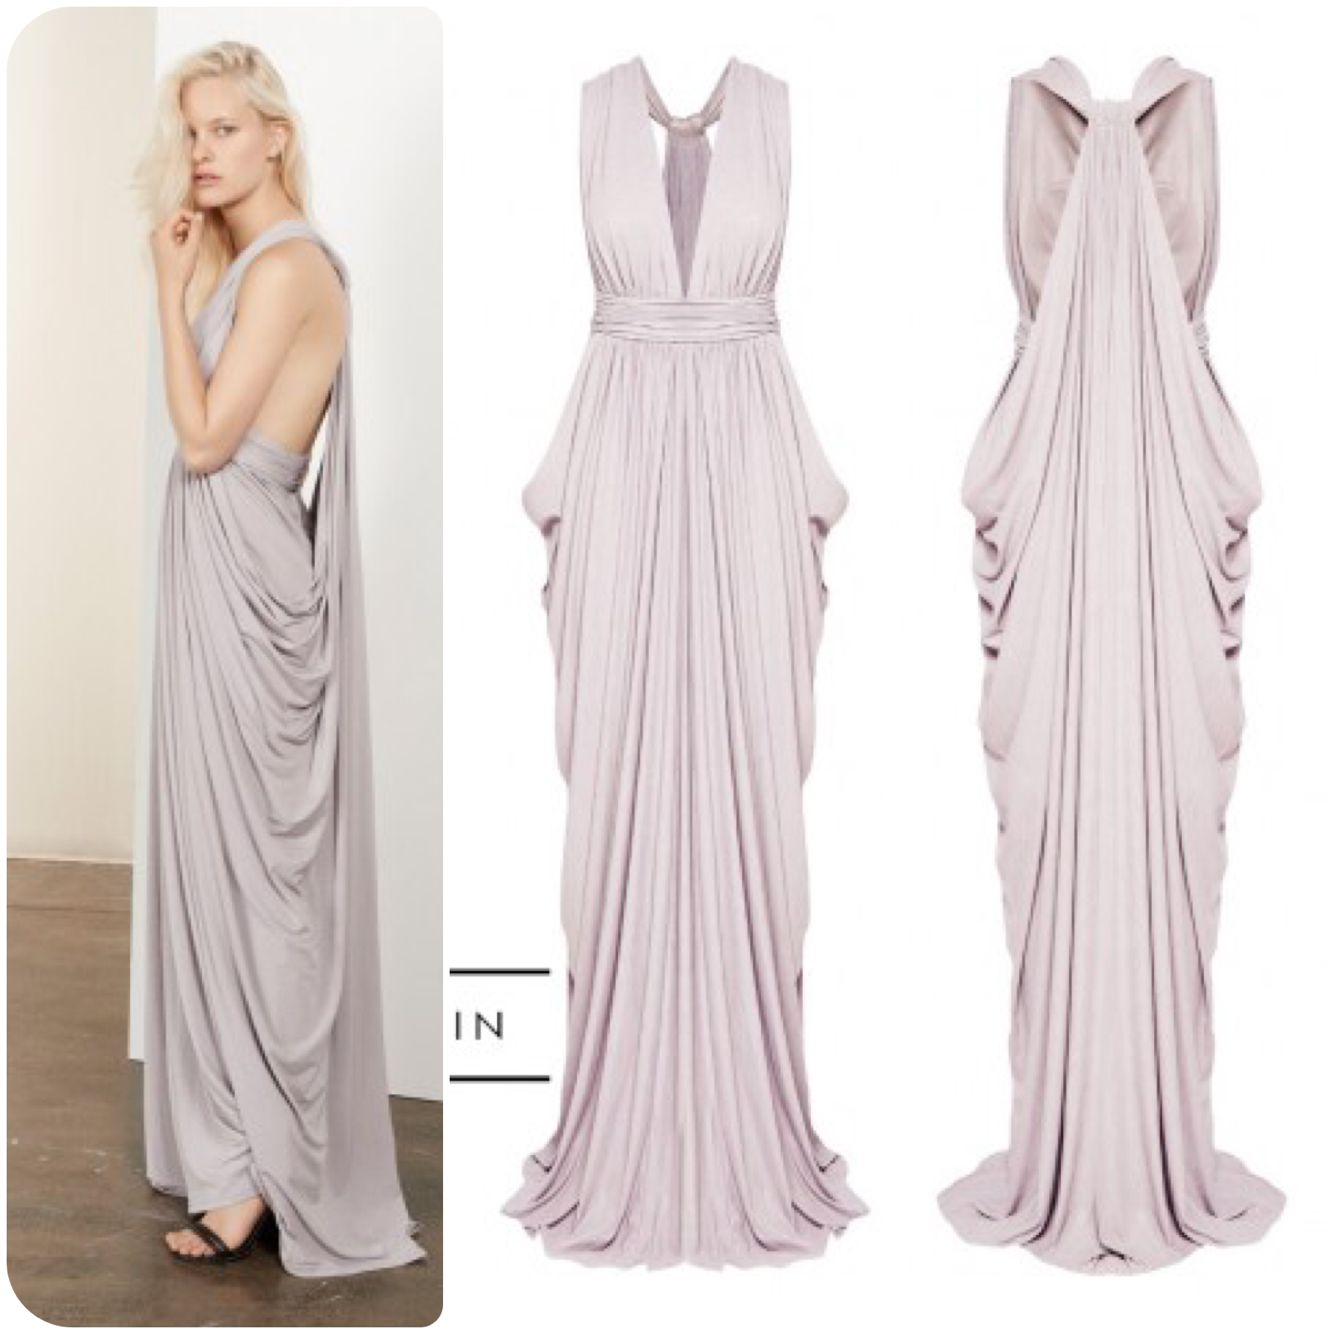 Sheike fairy tale maxi dress in lilac